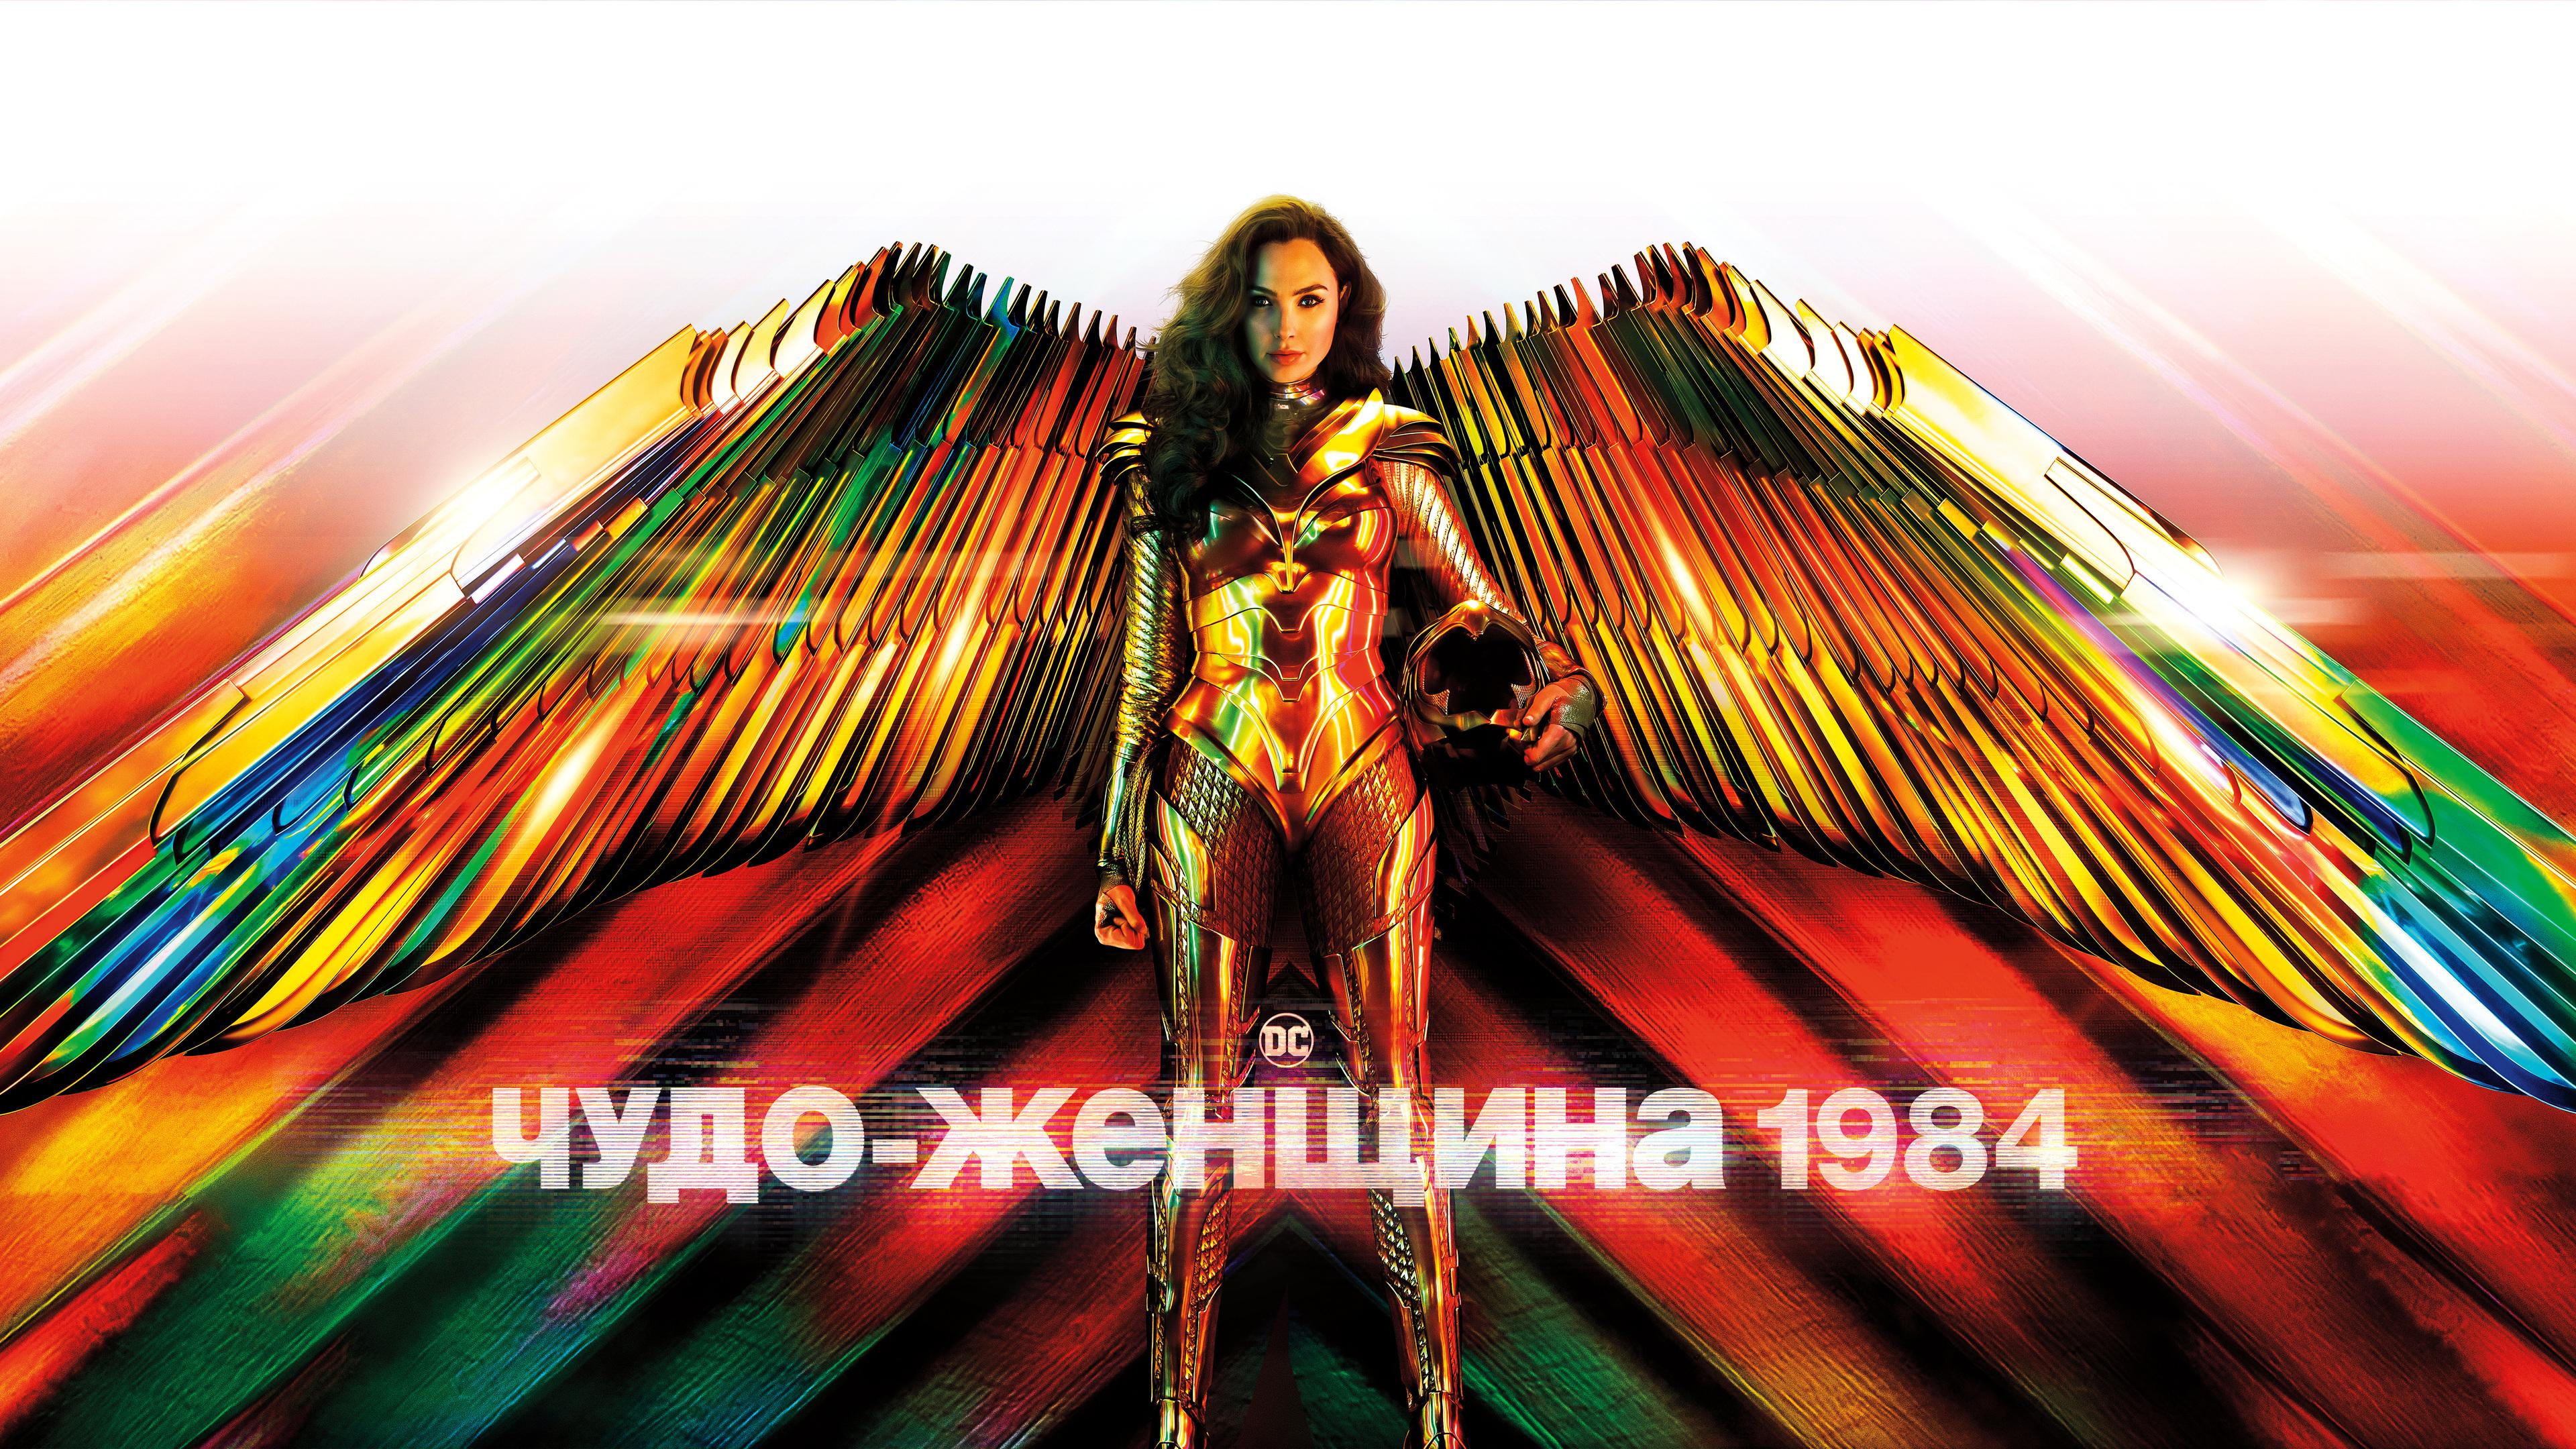 wonder-woman-1984-russian-poster-10k-k2.jpg